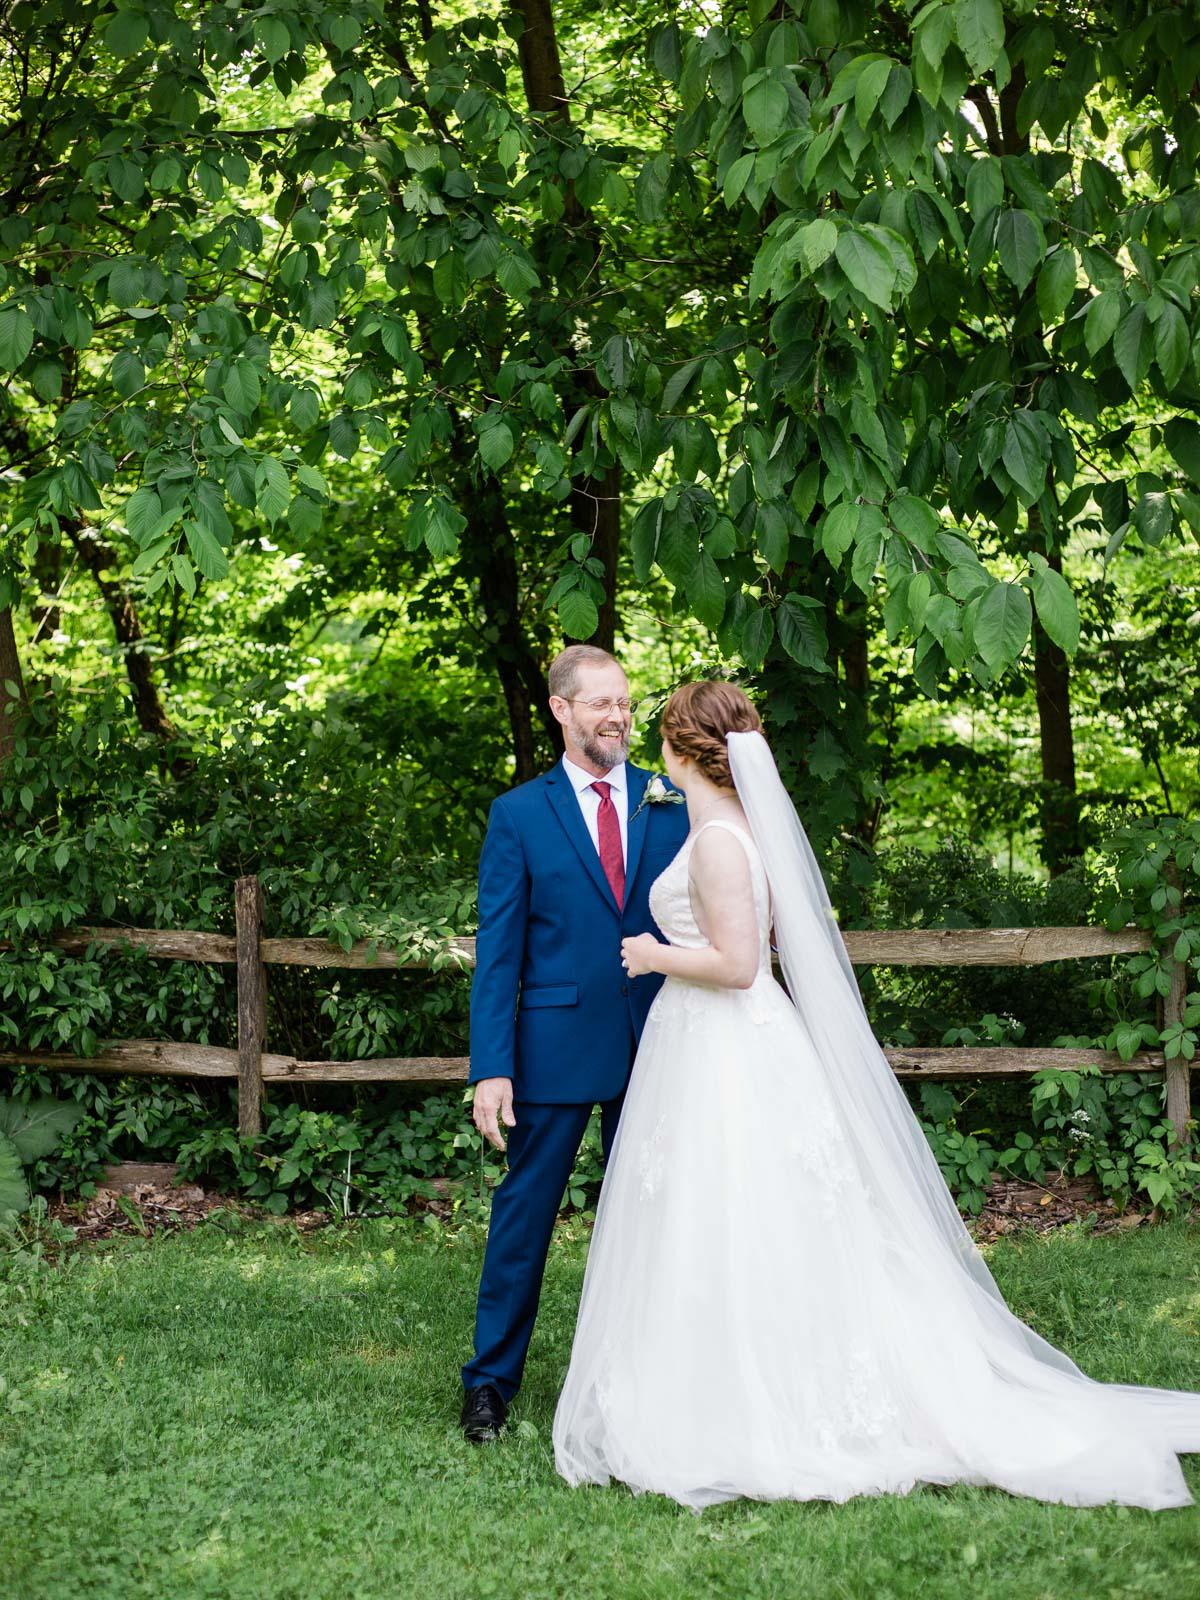 Stunning Summer Wedding in Cuyahoga Valley National Park-23.jpg